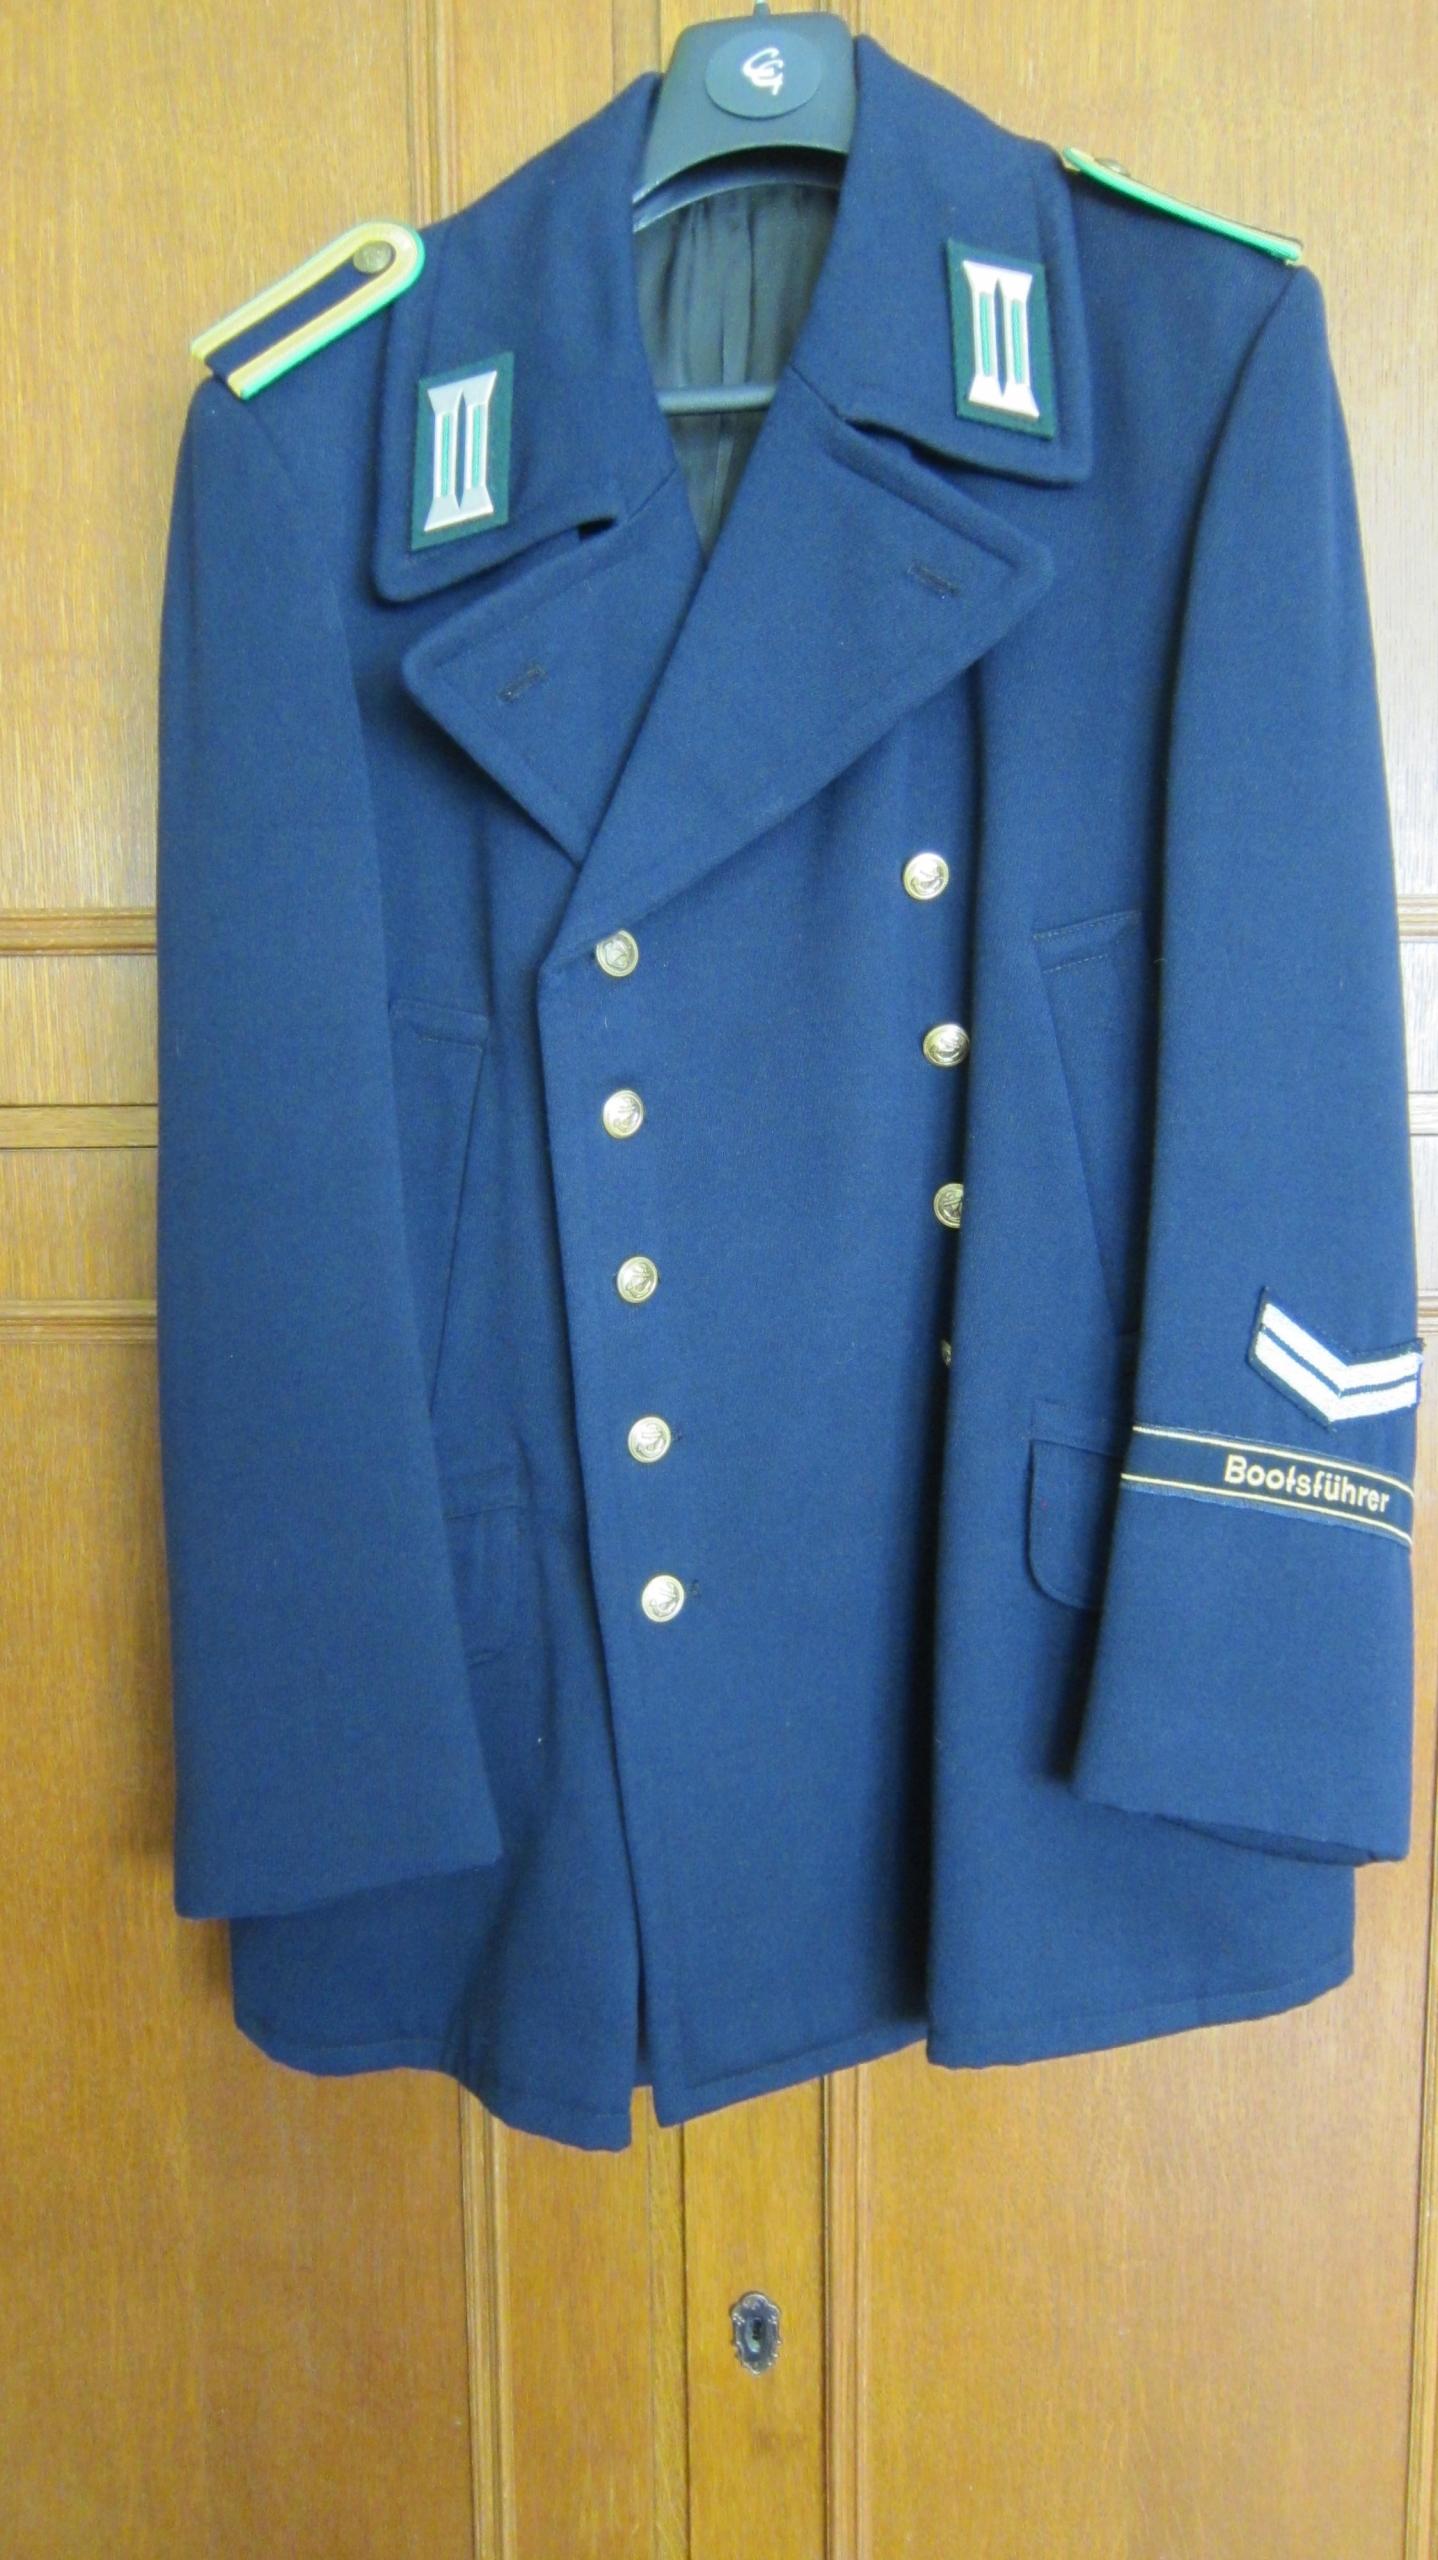 23971b7e9dd60 bosmanka w kategorii Militaria w Oficjalnym Archiwum Allegro - archiwum  ofert